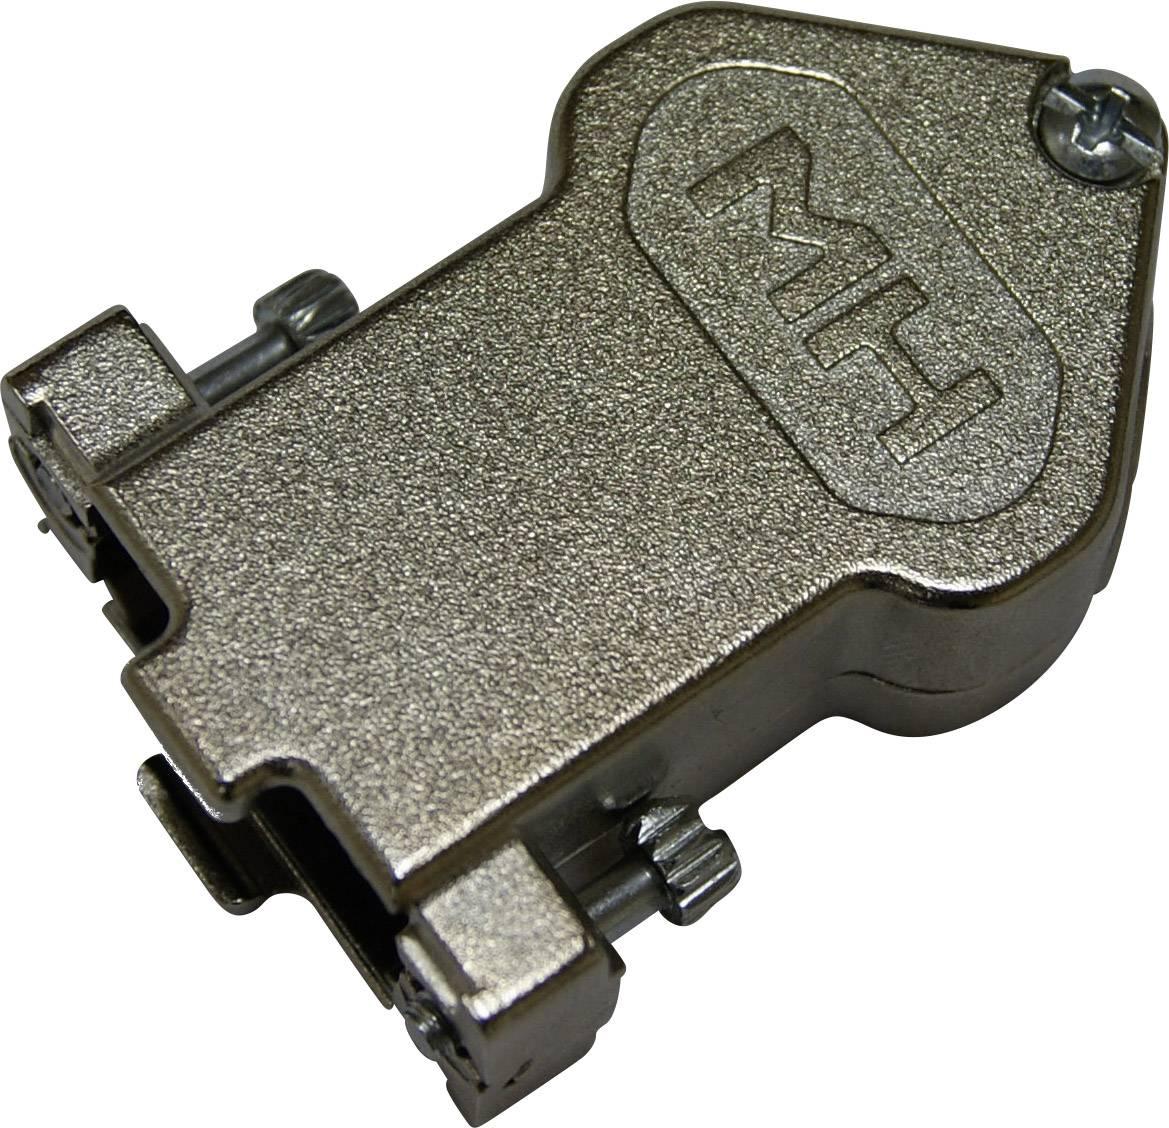 D-SUB púzdro MH Connectors MHDU45ZK15-K MHDU45ZK15-K, Počet pinov: 15, poniklovaná, 45 °, niklová, 1 ks